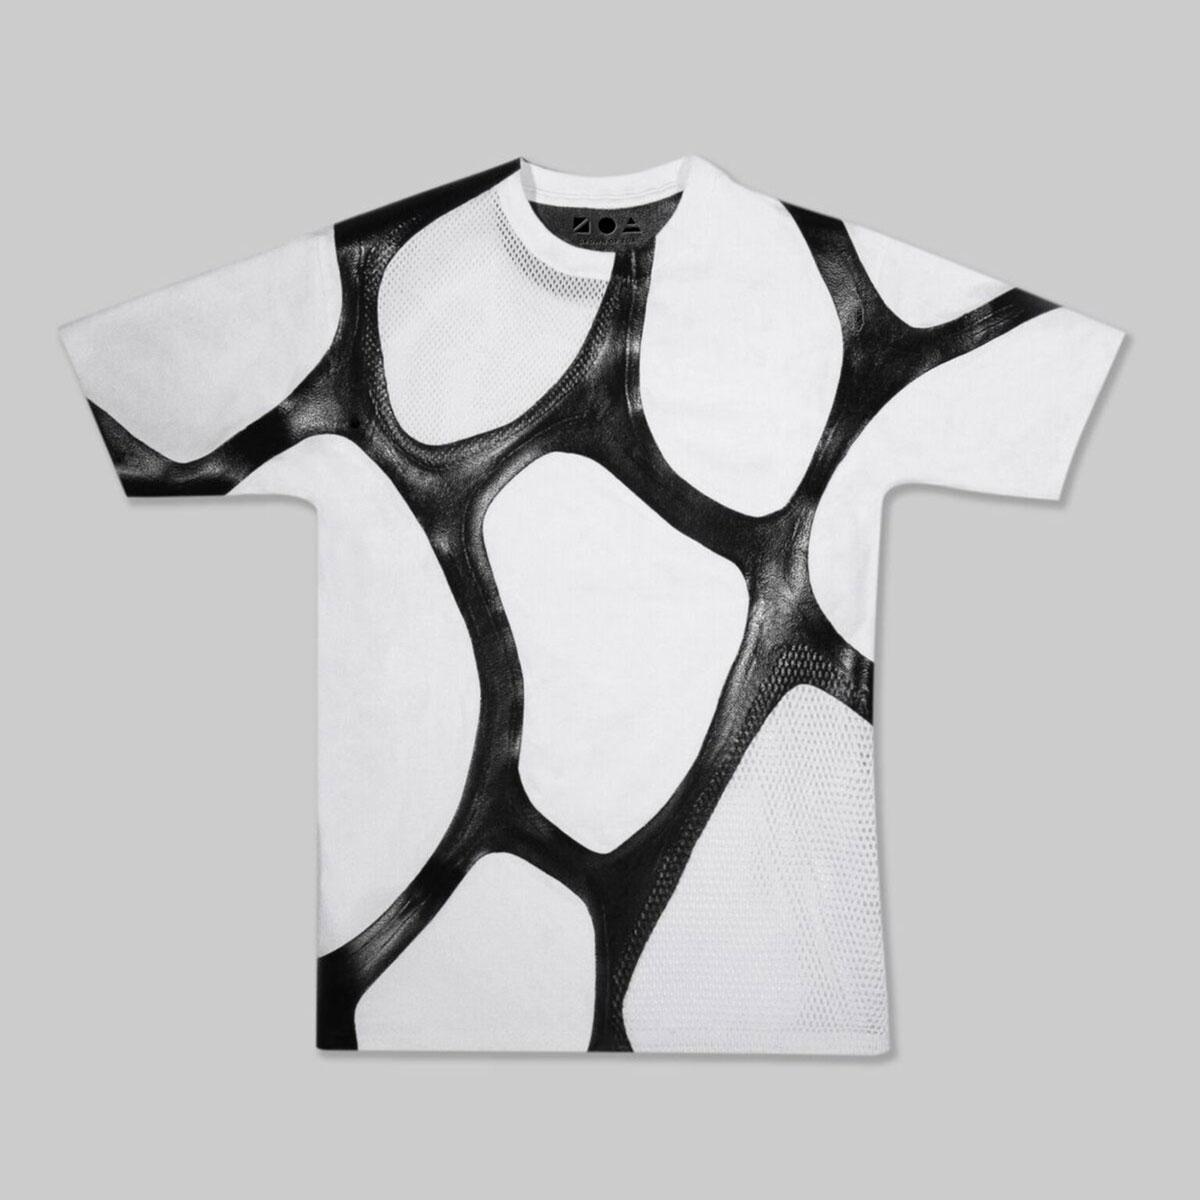 T-Shirt mit Zoa-Lederstreifen aus dem Fermentationstank schaffte es sogar in Museum of Modern Art..